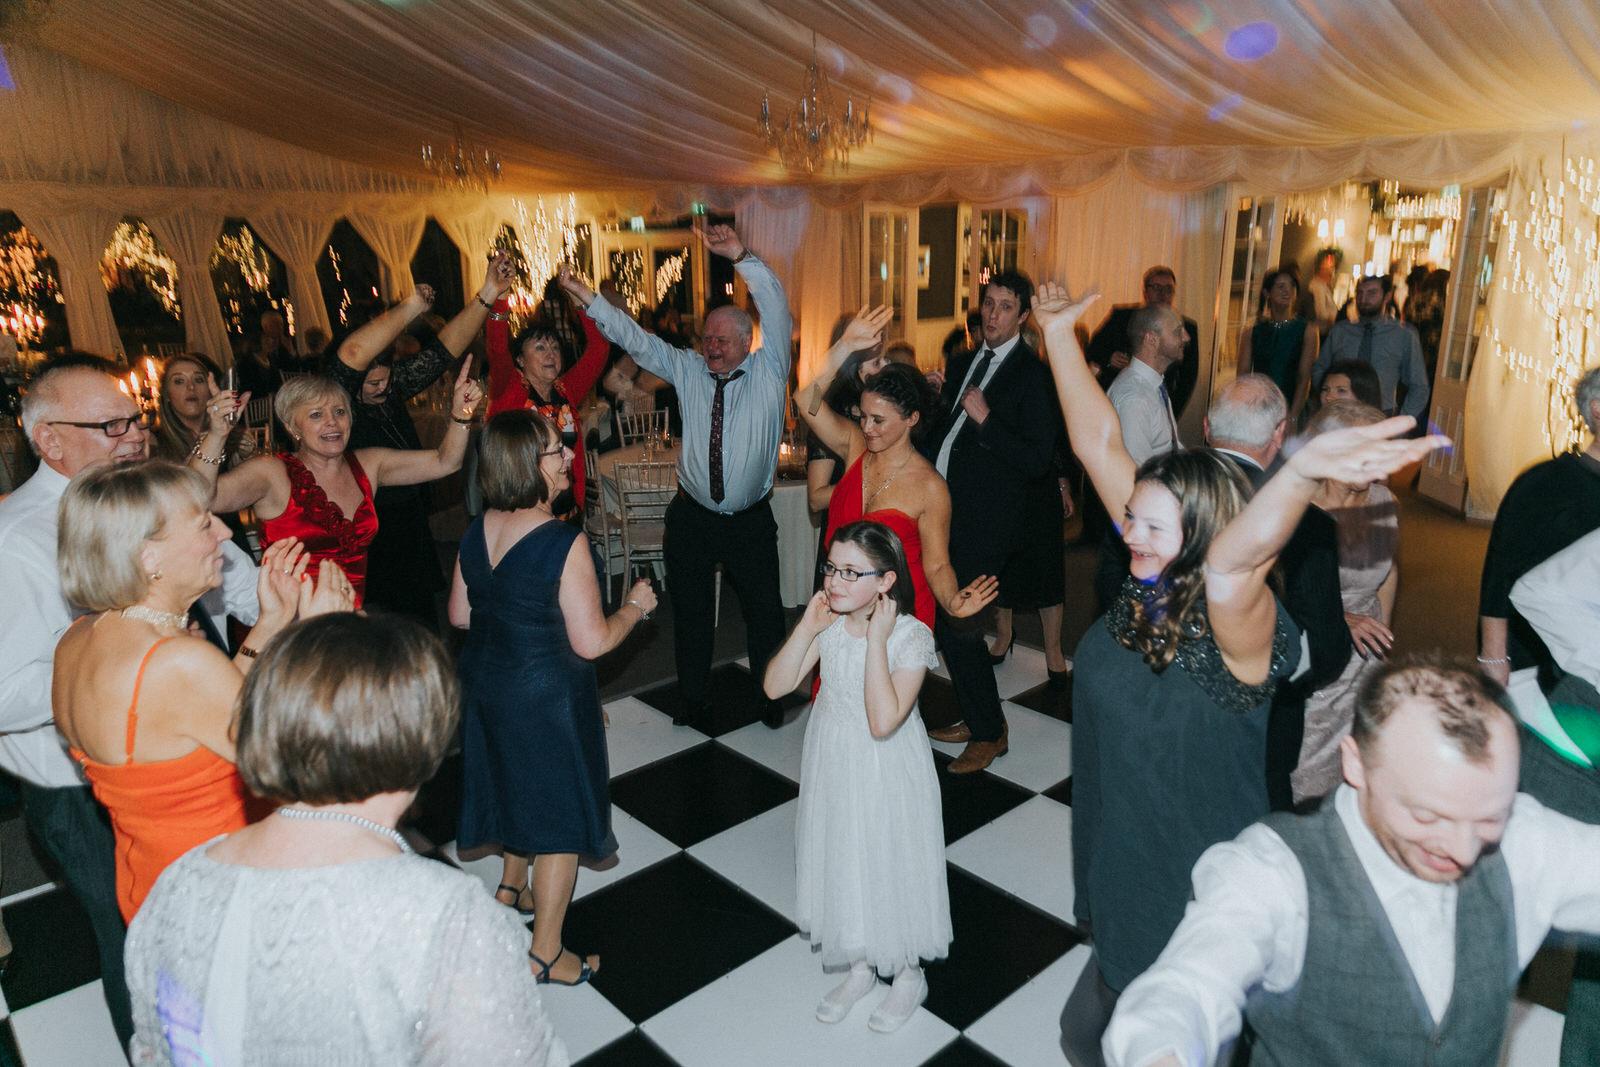 Clonabreany_wedding-photographer_roger_kenny_ireland_124.jpg